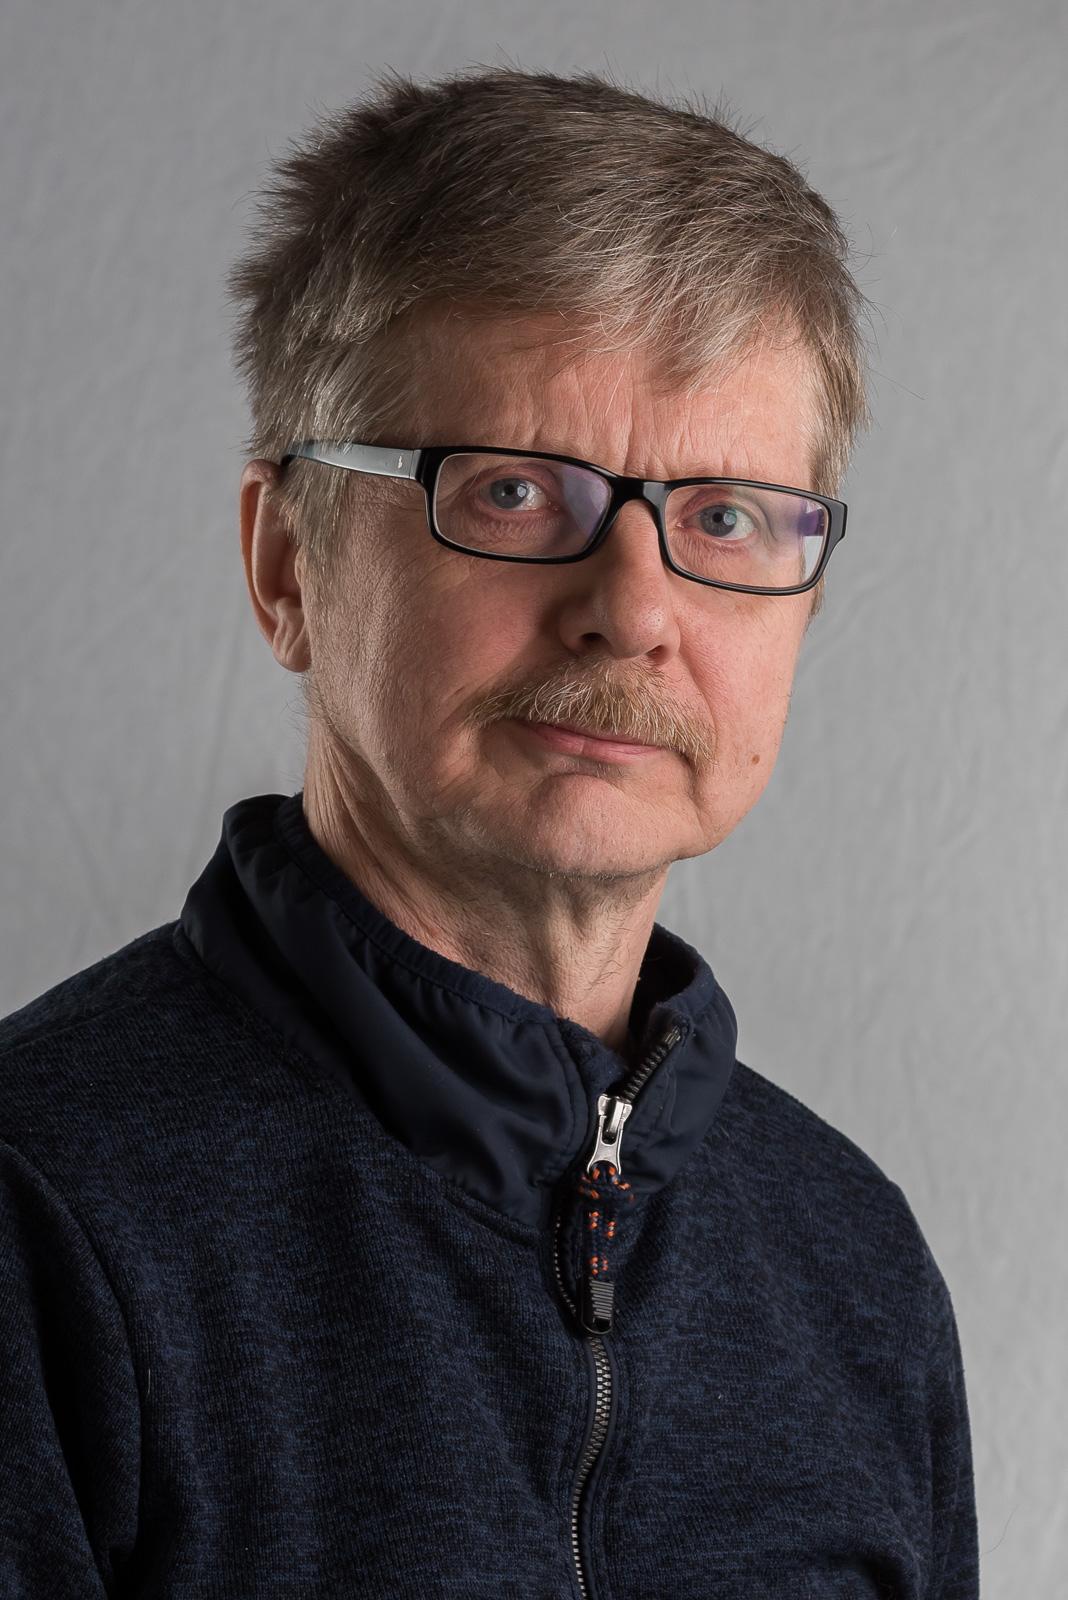 Pekka Ojala